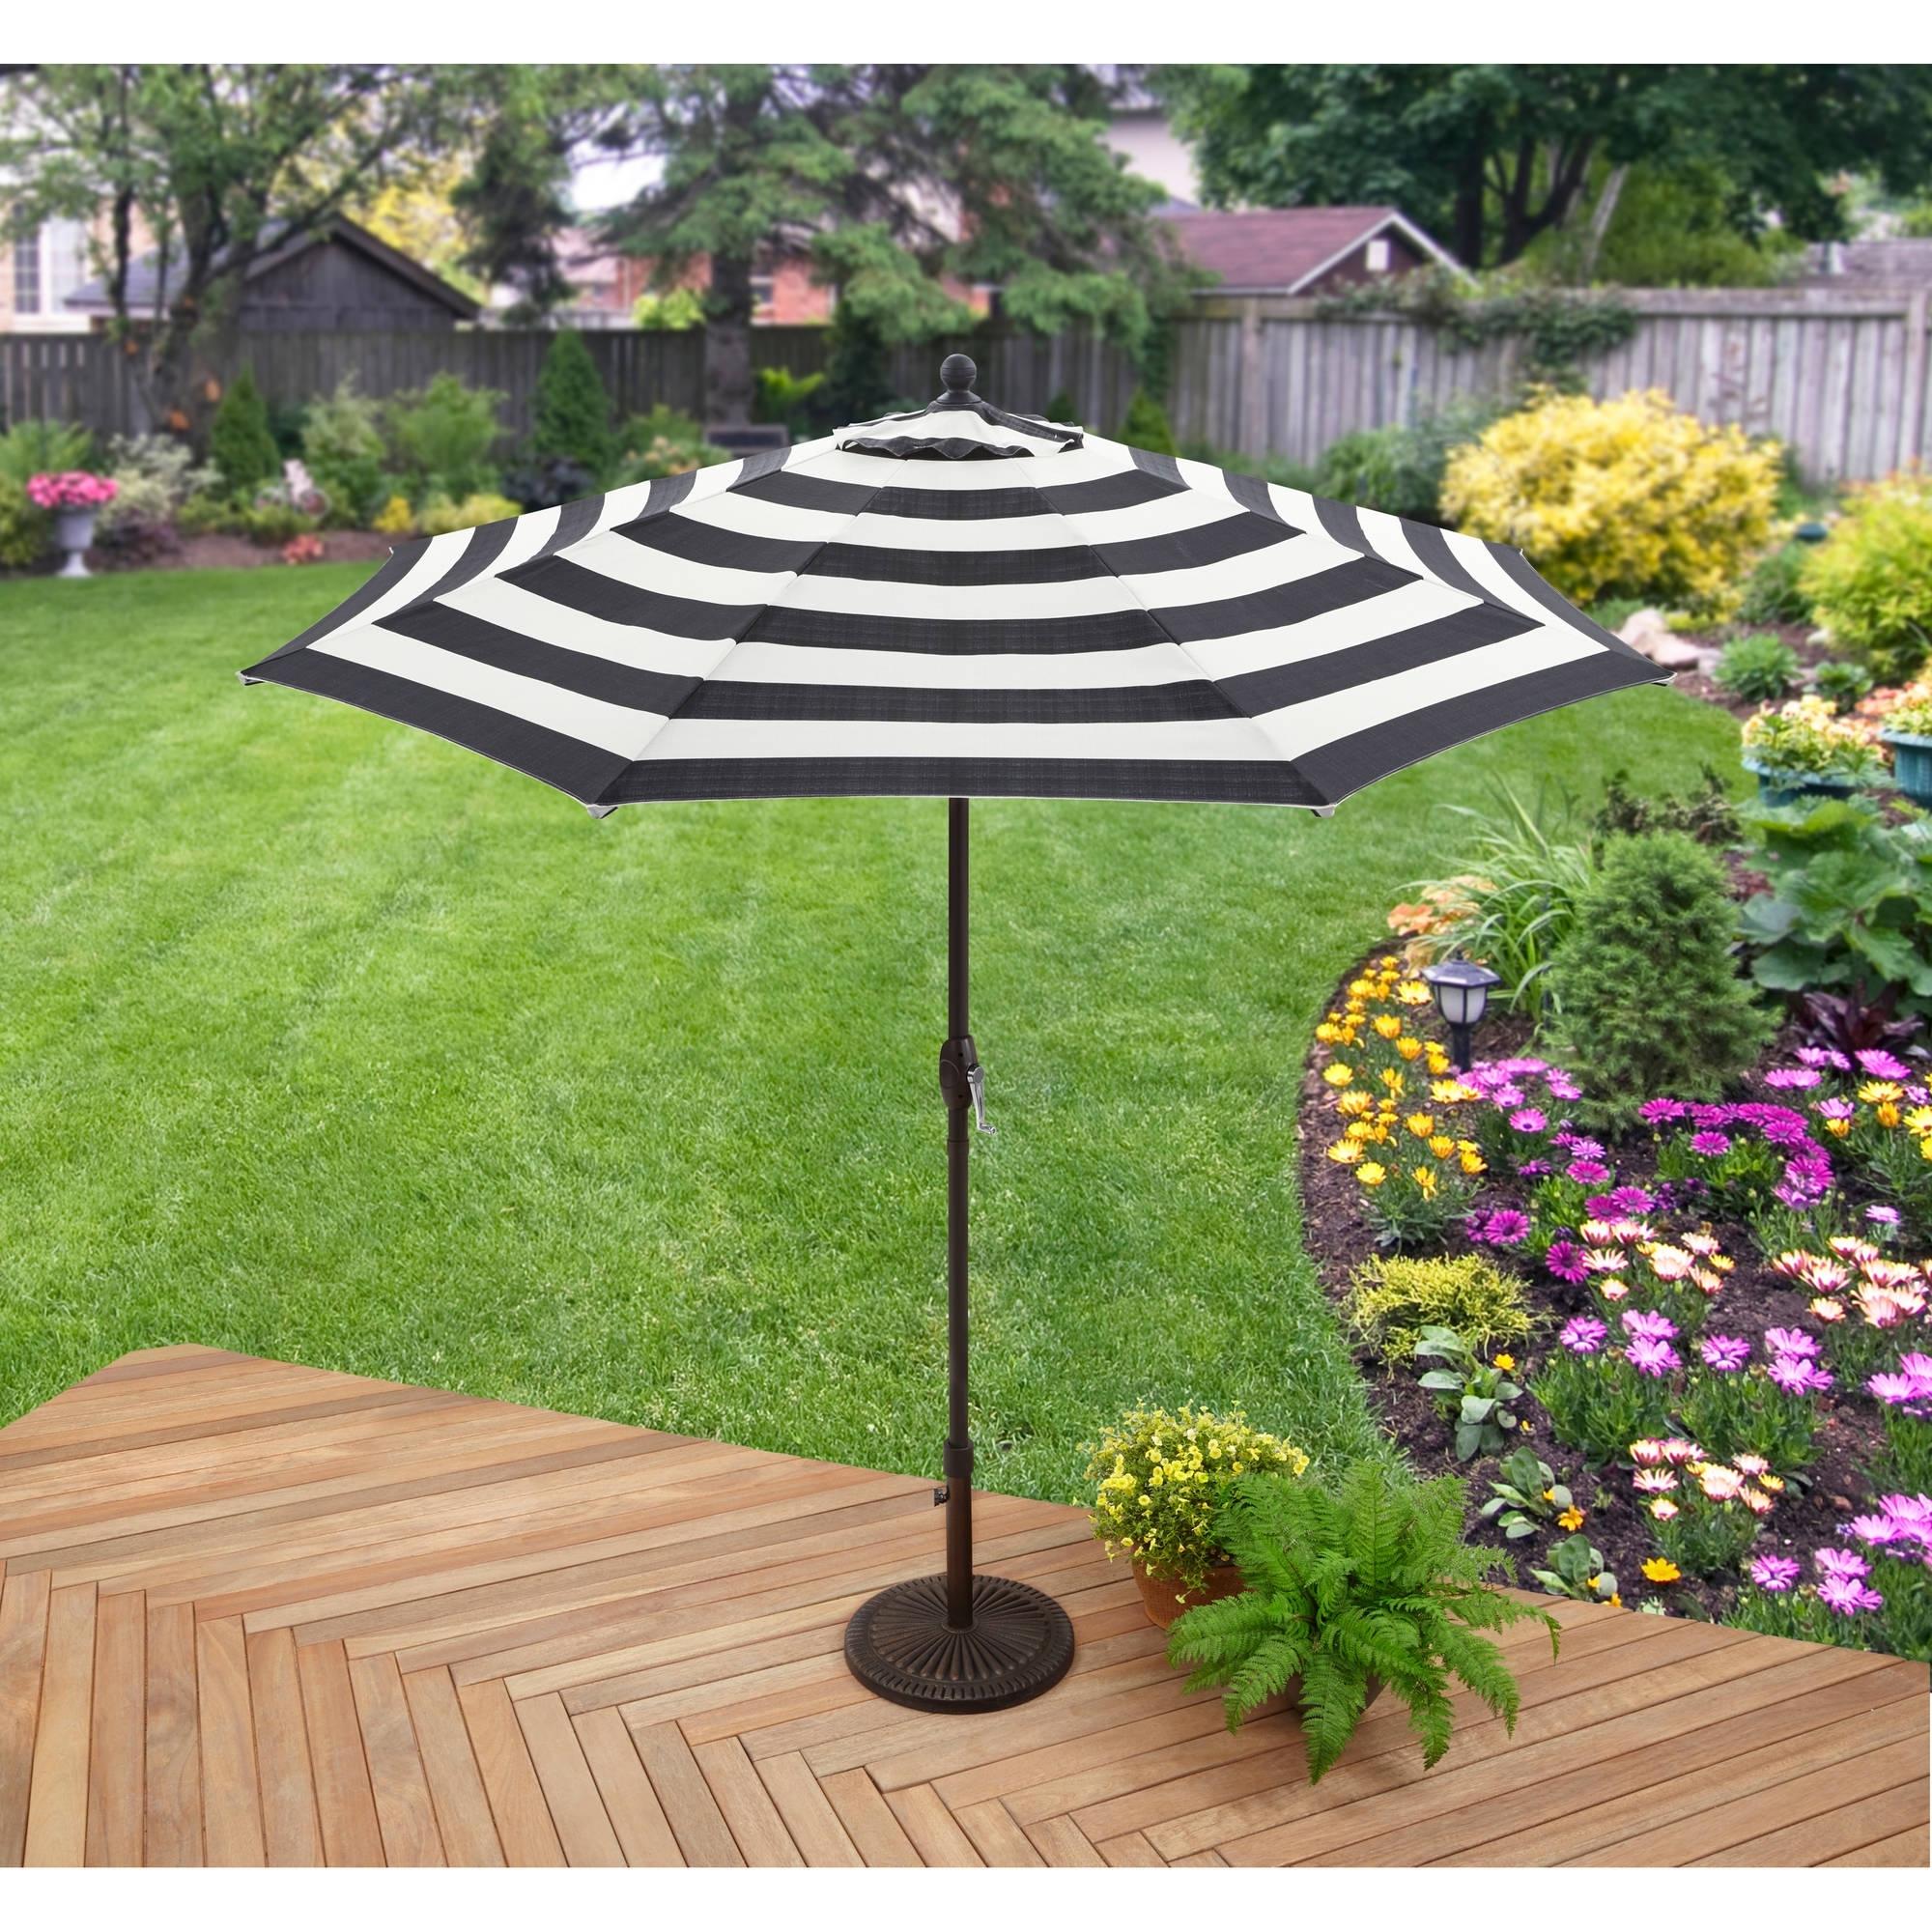 Favorite Custom Sunbrella Patio Umbrellas In Better Homes And Gardens 9' Market Umbrella, Cabana Stripe – Walmart (View 13 of 20)